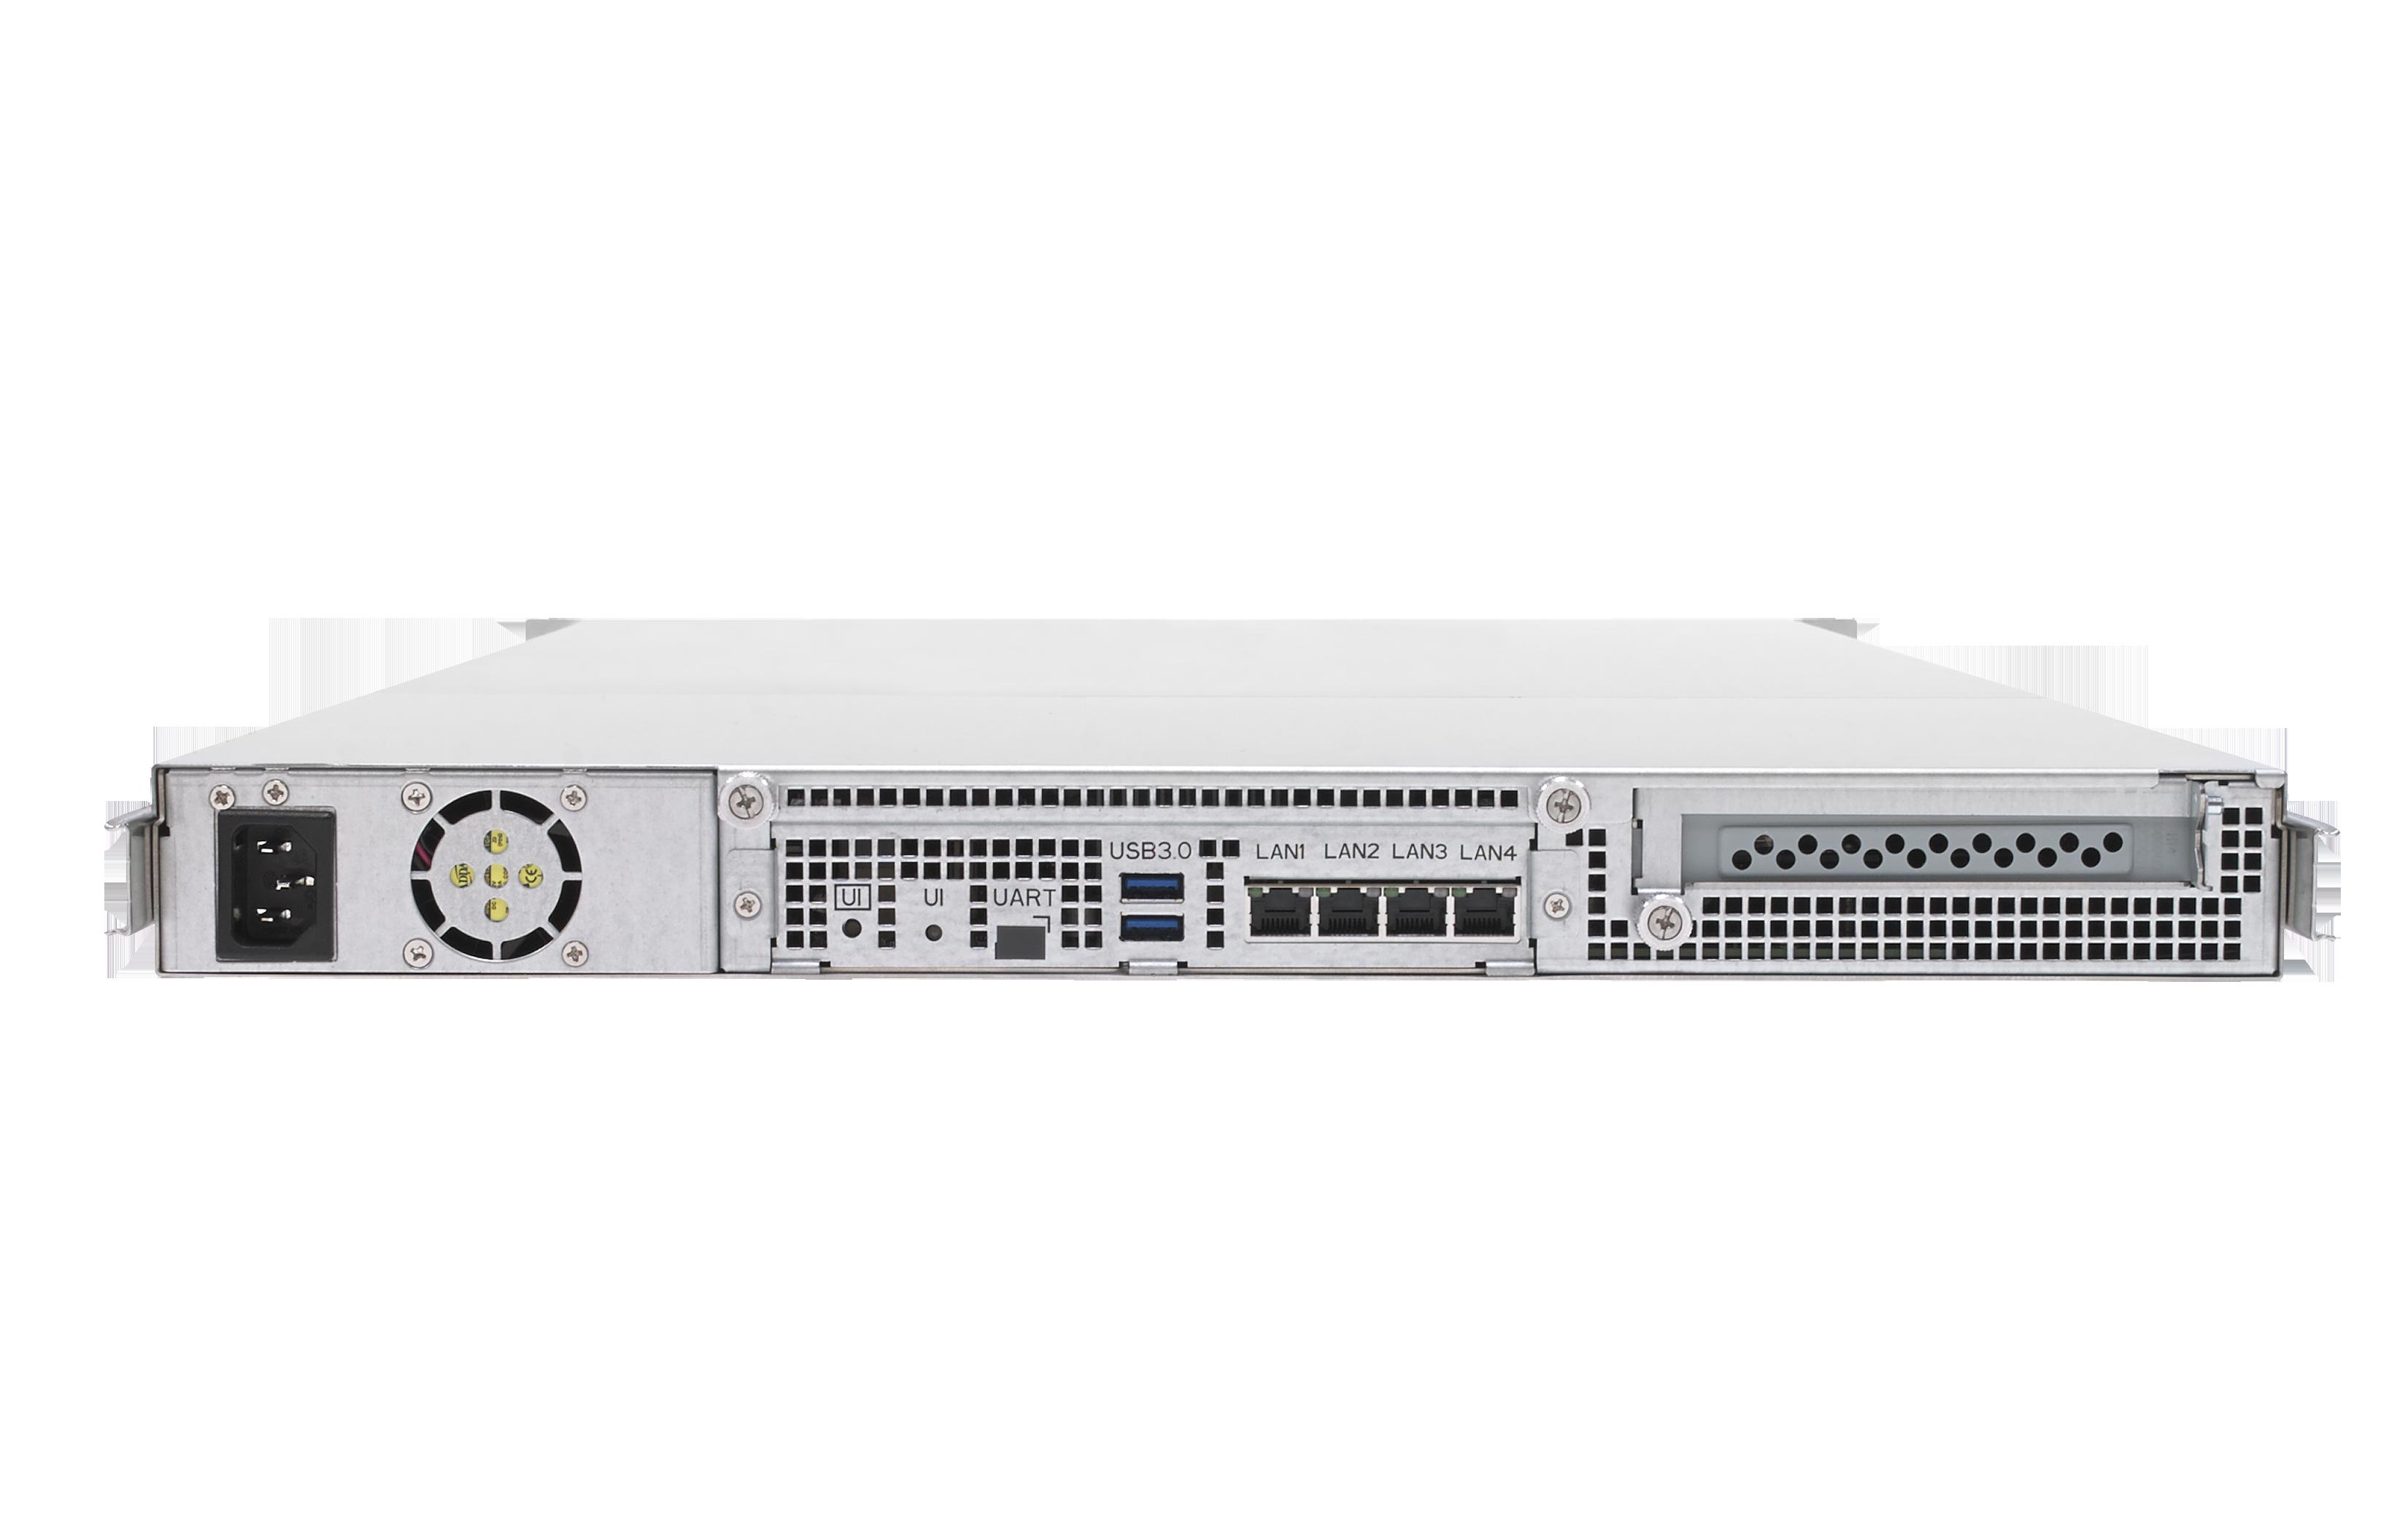 ReadyNAS Business Rackmount Storage - RR2312 | ReadyNAS